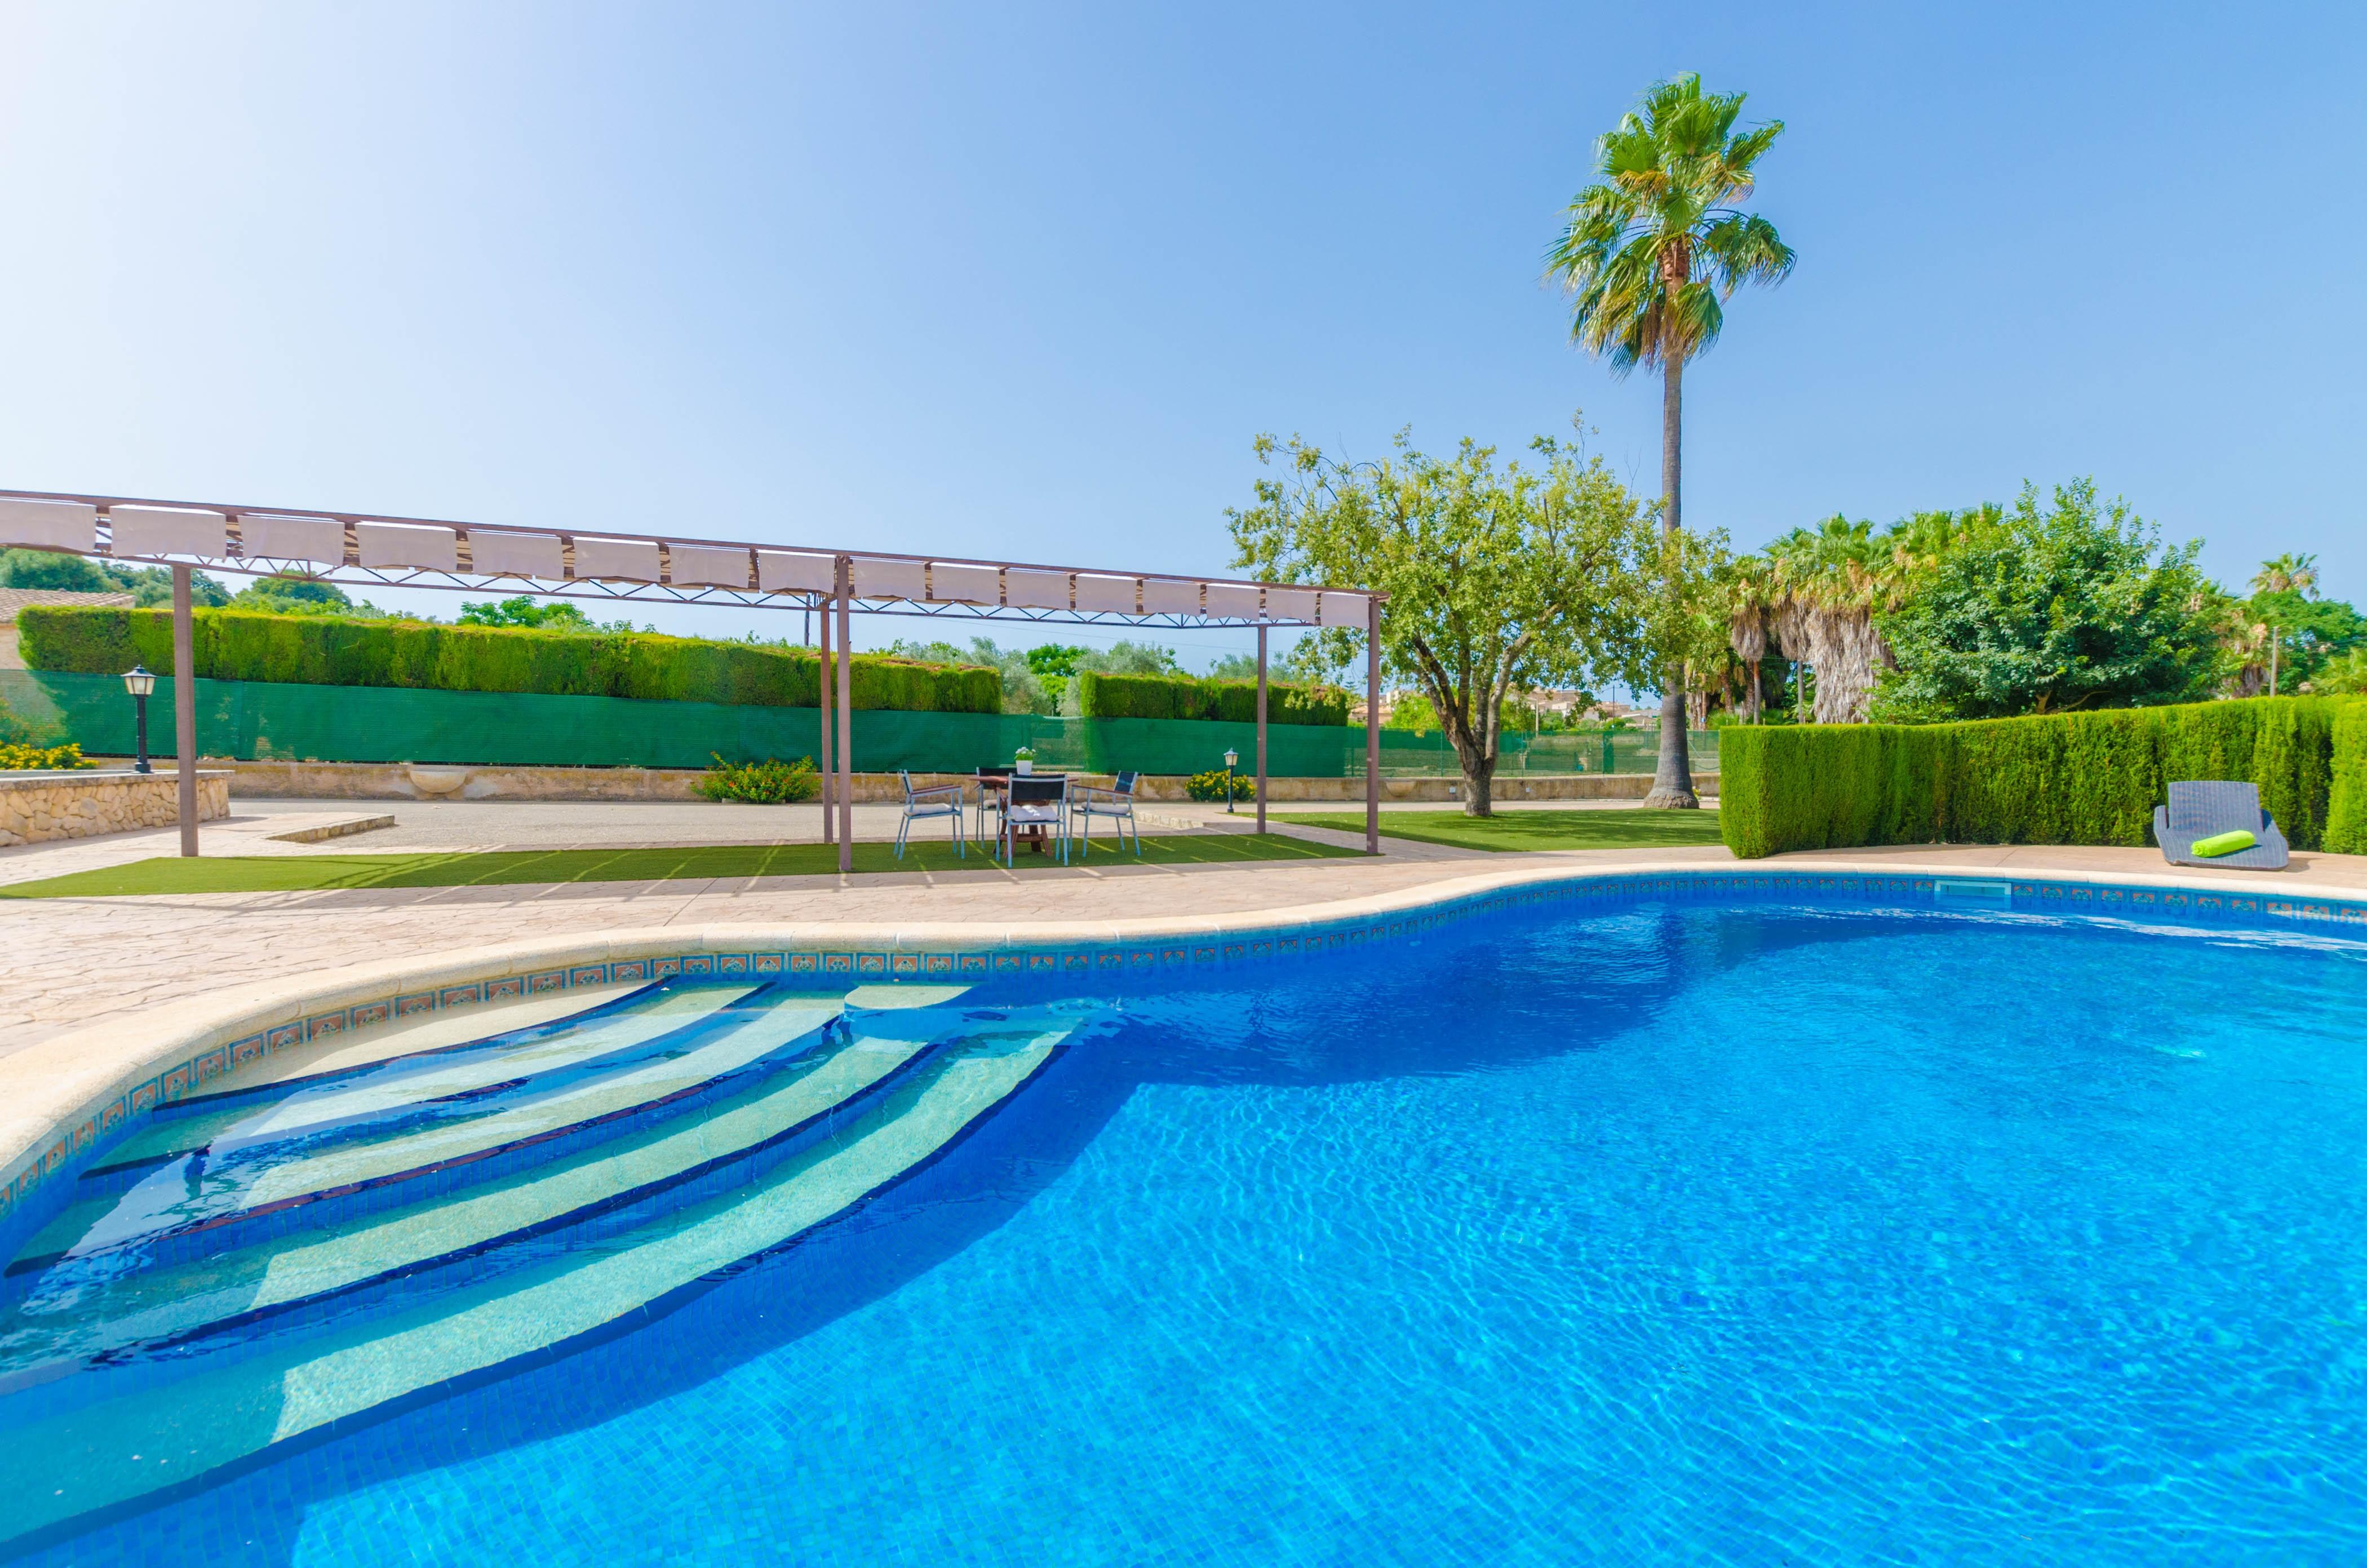 Maison de vacances SA SINIA (2374876), Lloret de Vistalegre, Majorque, Iles Baléares, Espagne, image 5